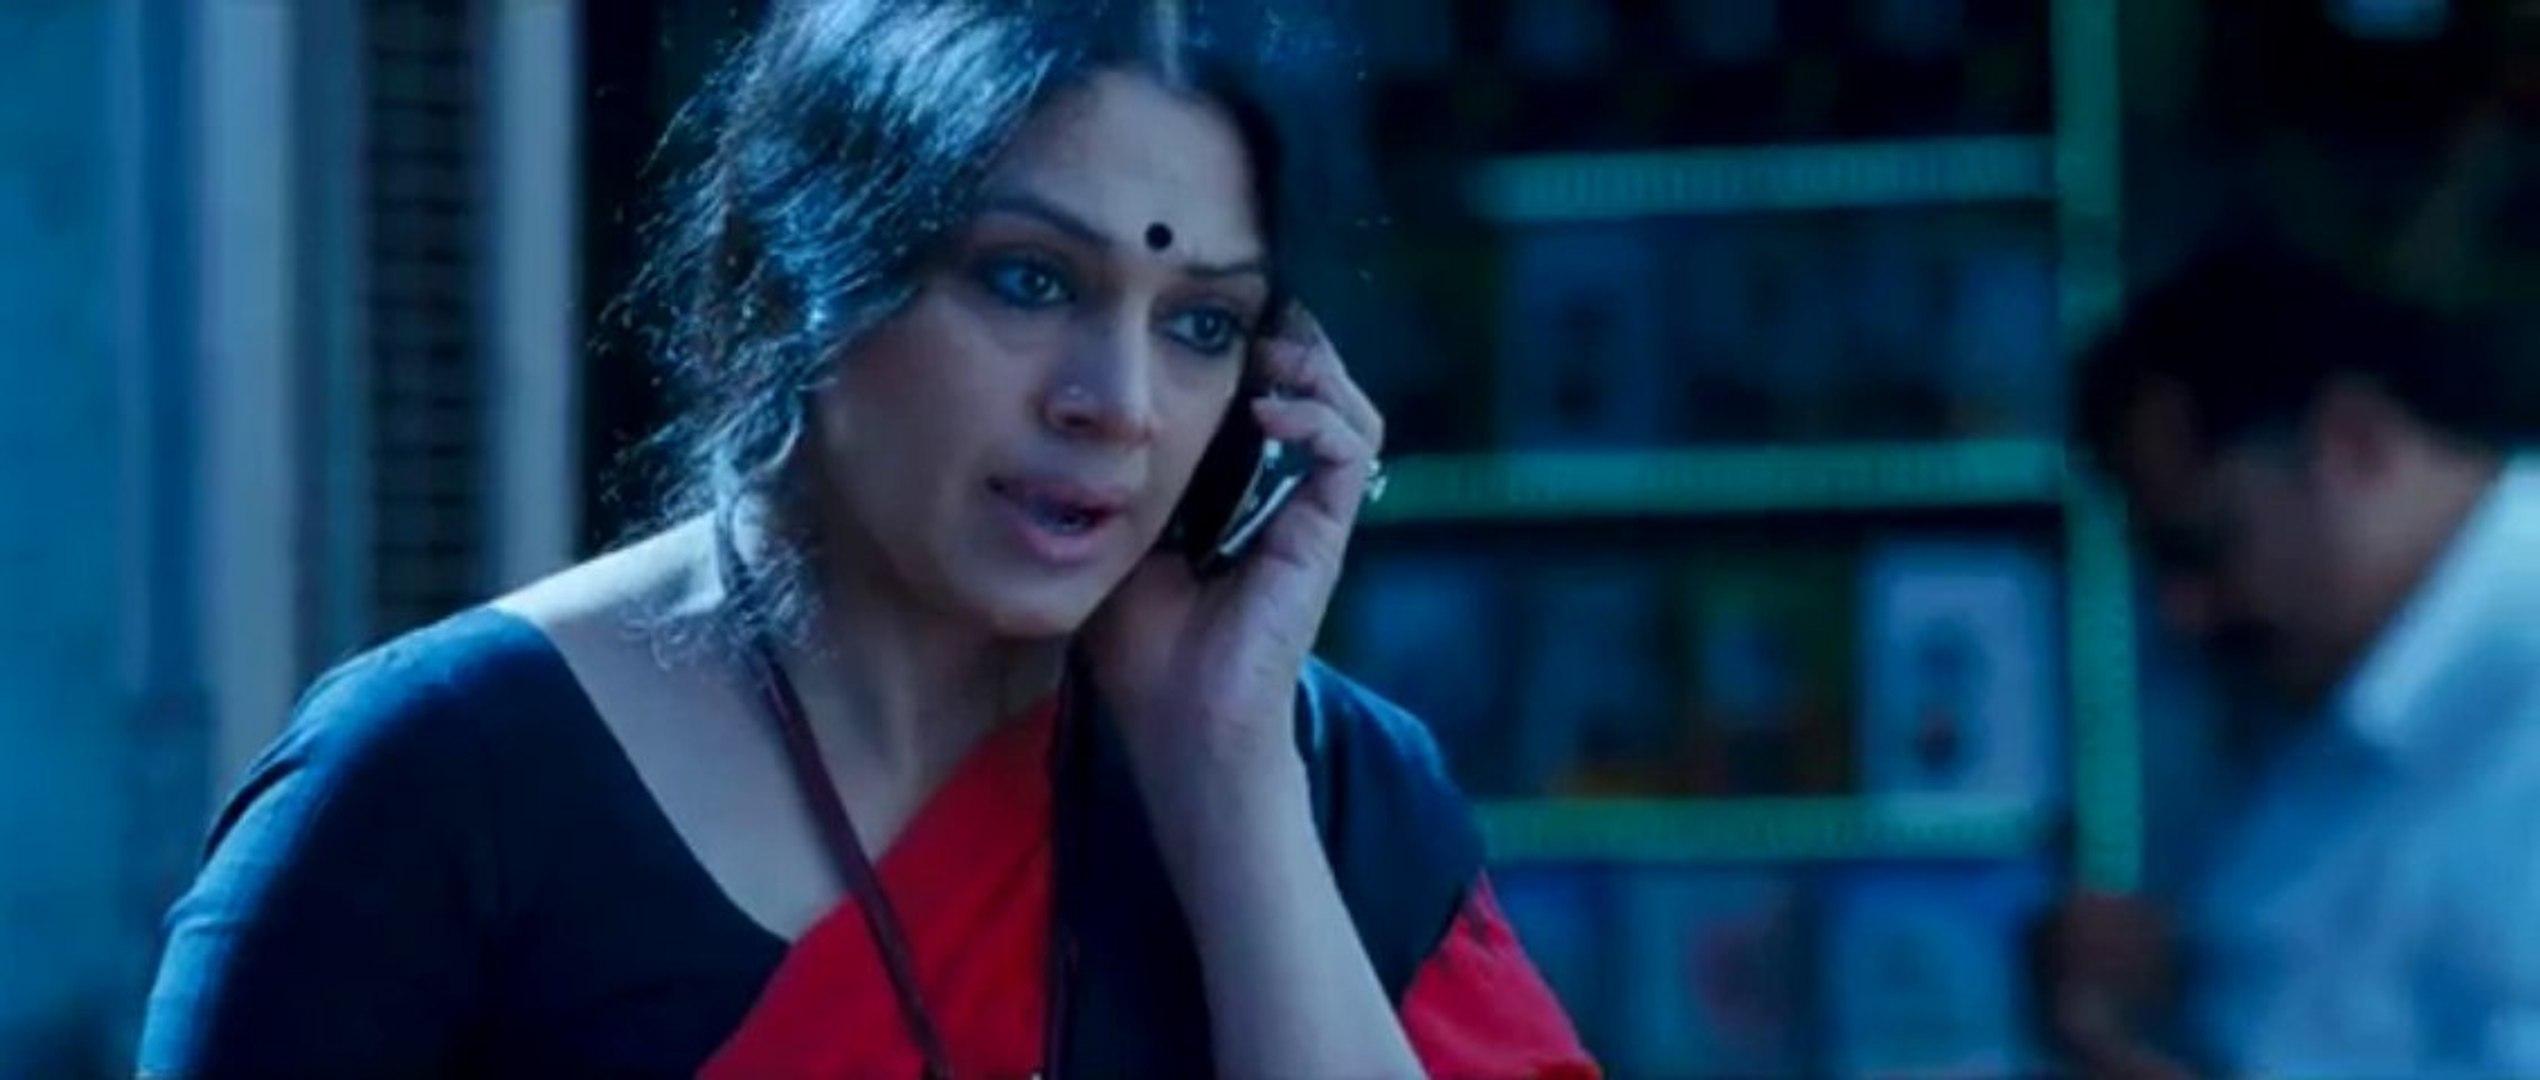 thira malayalam movie trailer - video Dailymotion